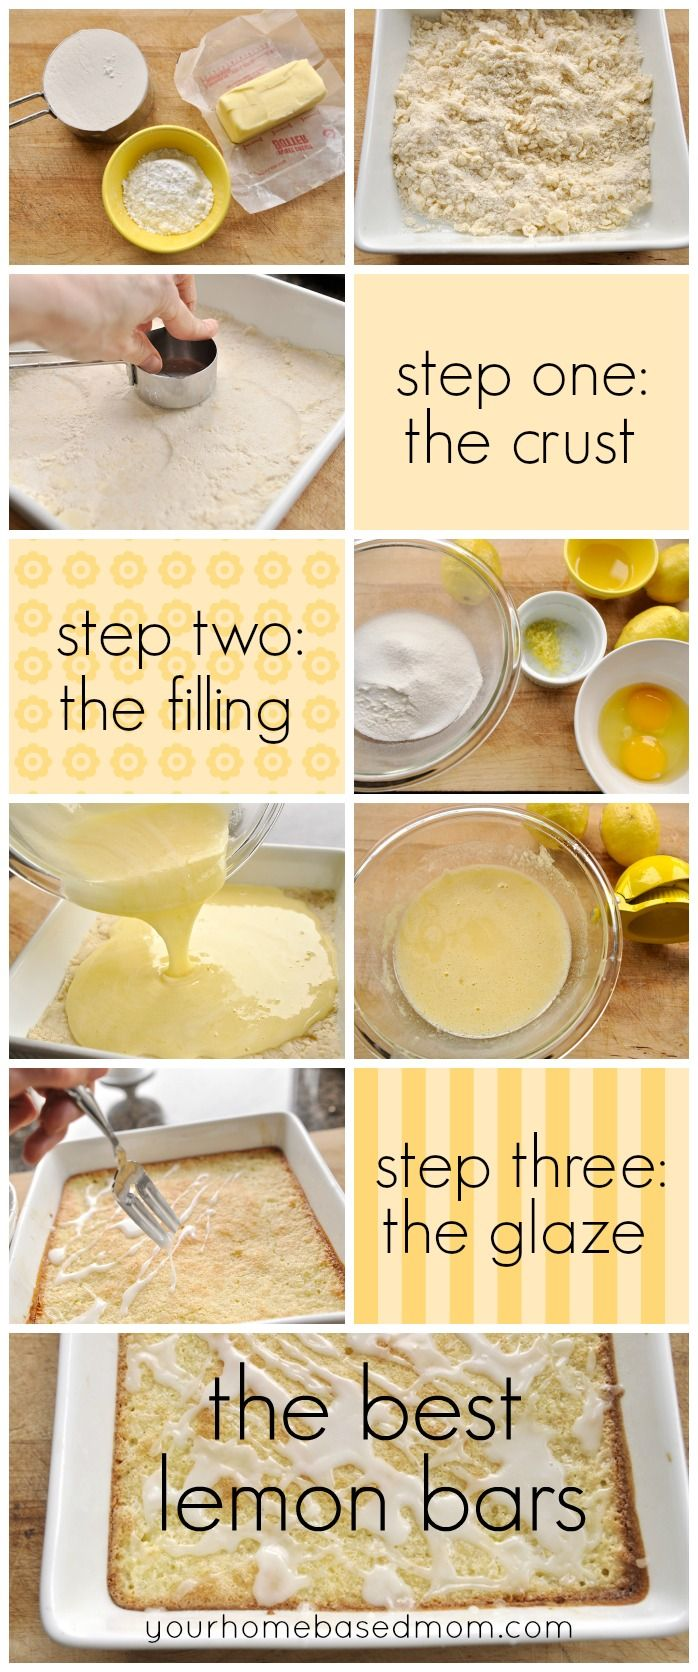 The Best Lemon Bars Recipe With Images Lemon Bars Recipe